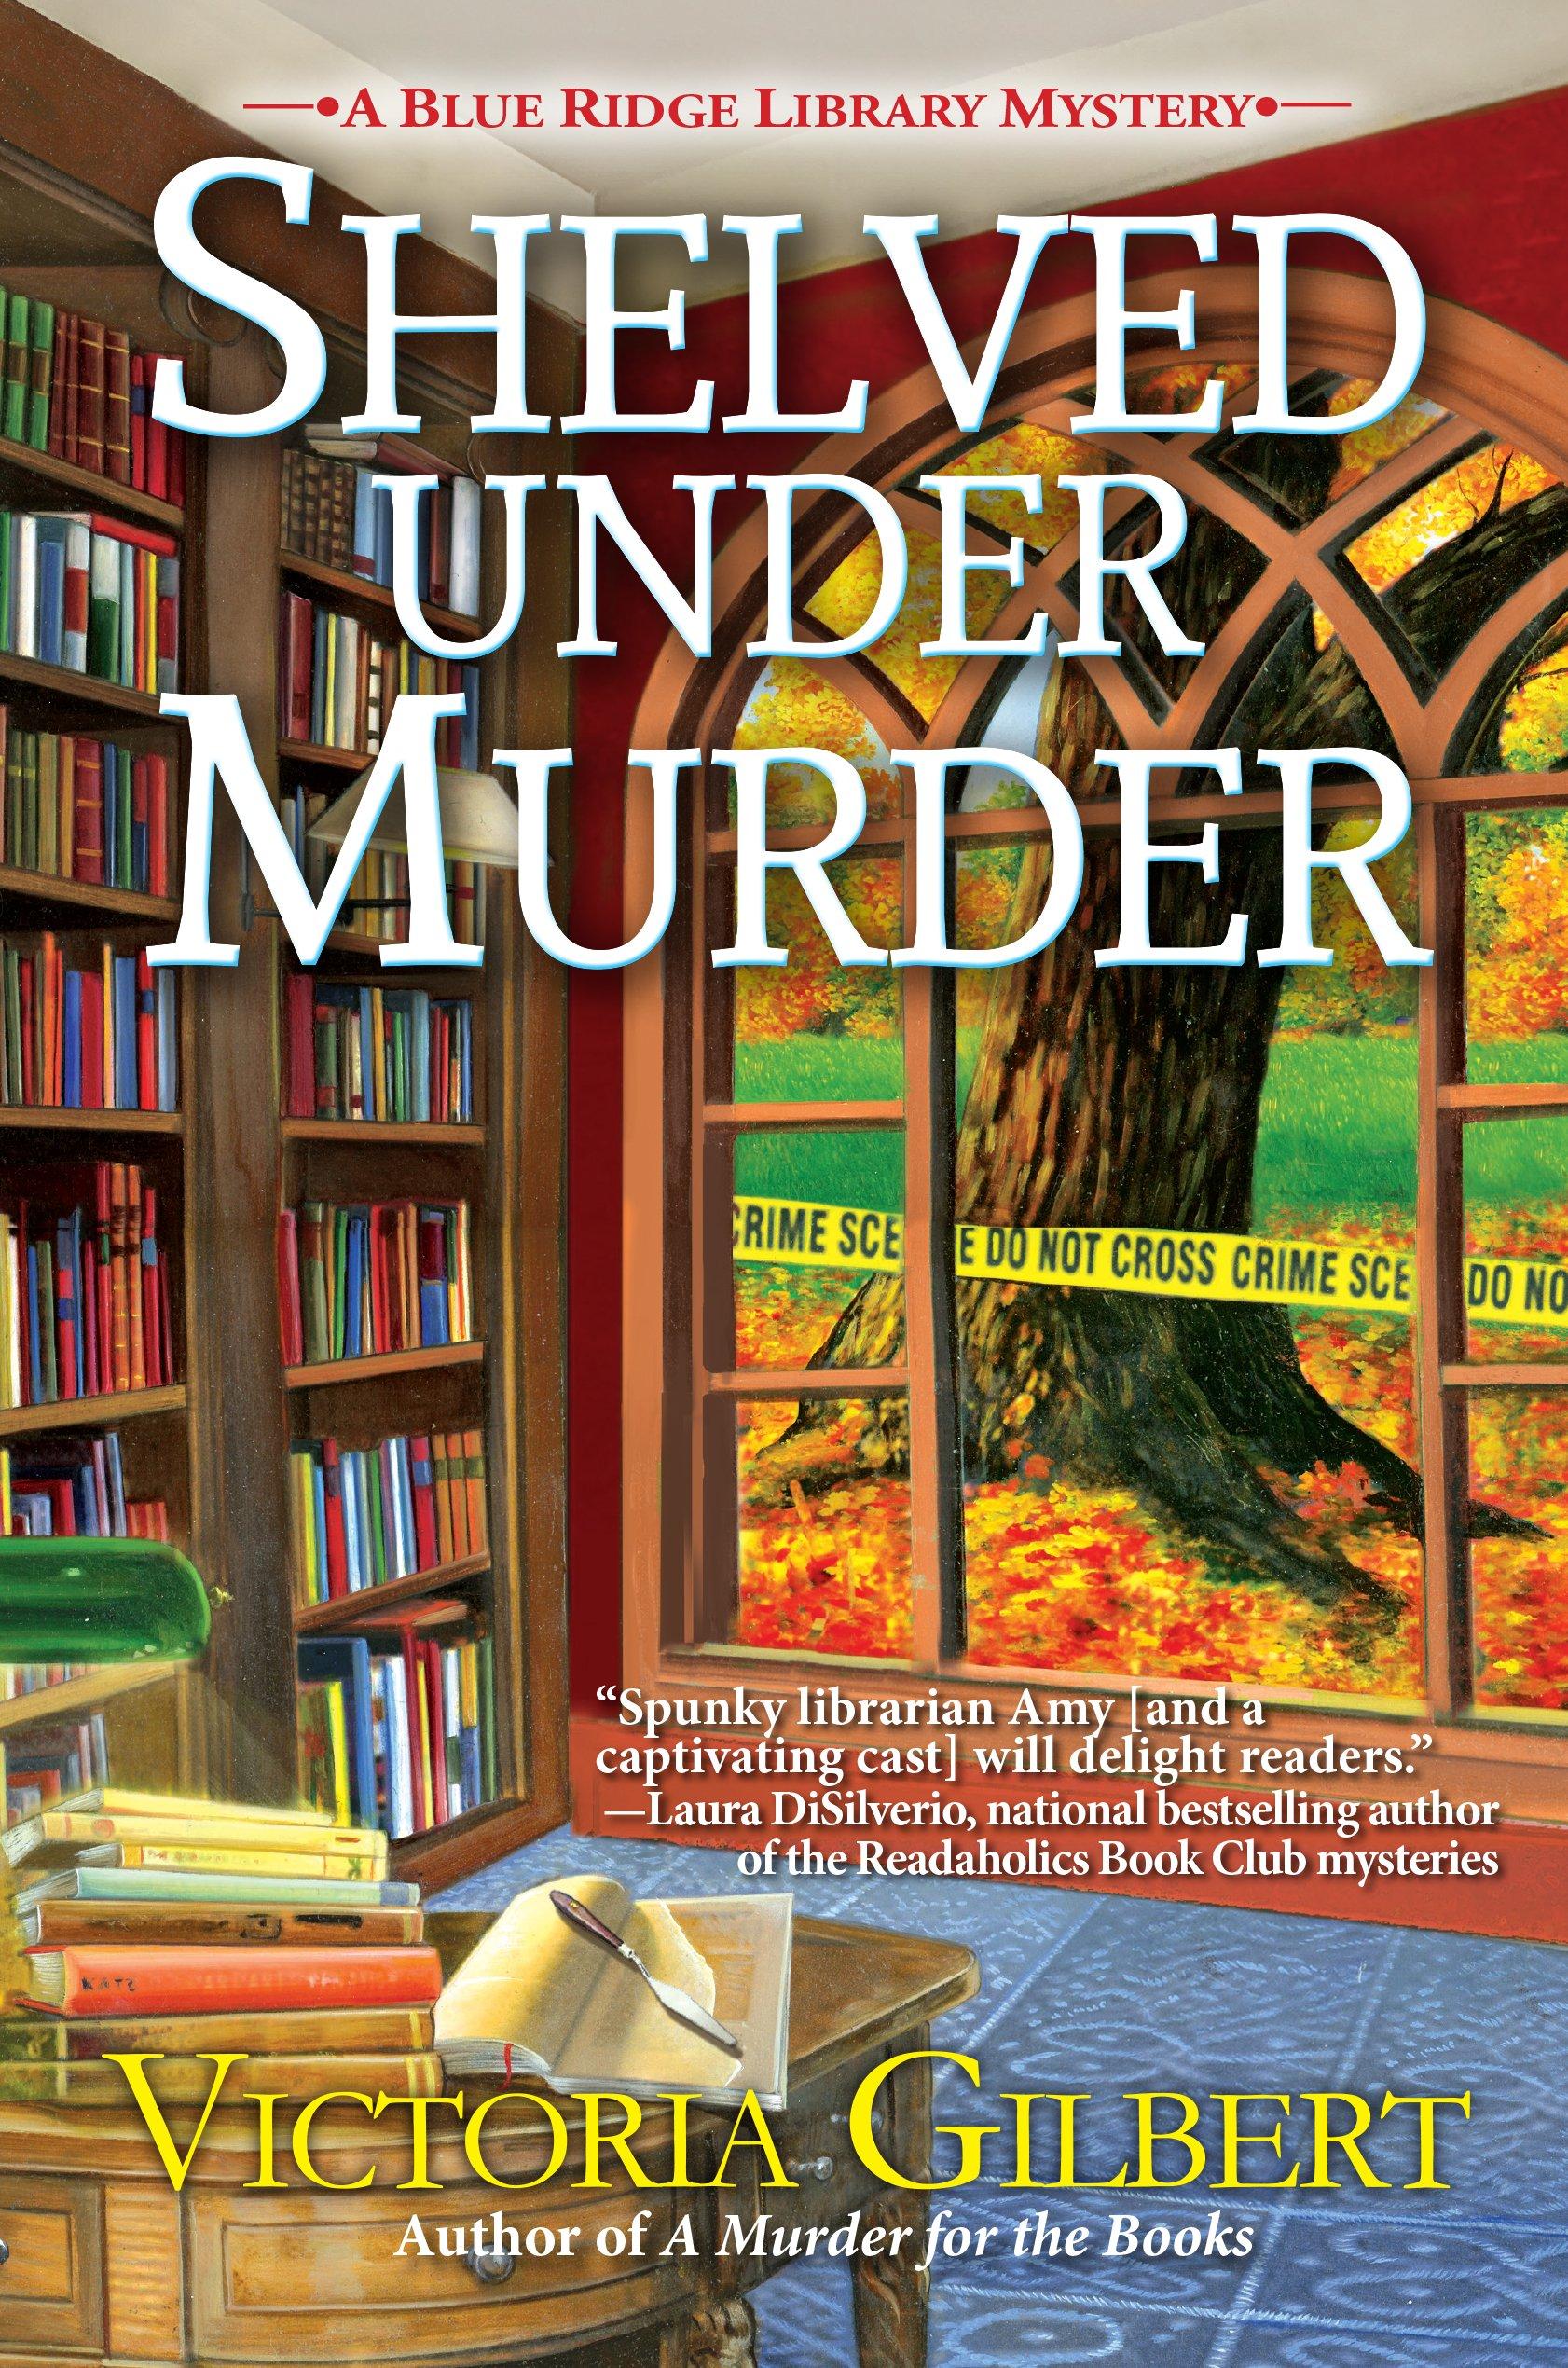 Shelved Under Murder: A Blue Ridge Library Mystery